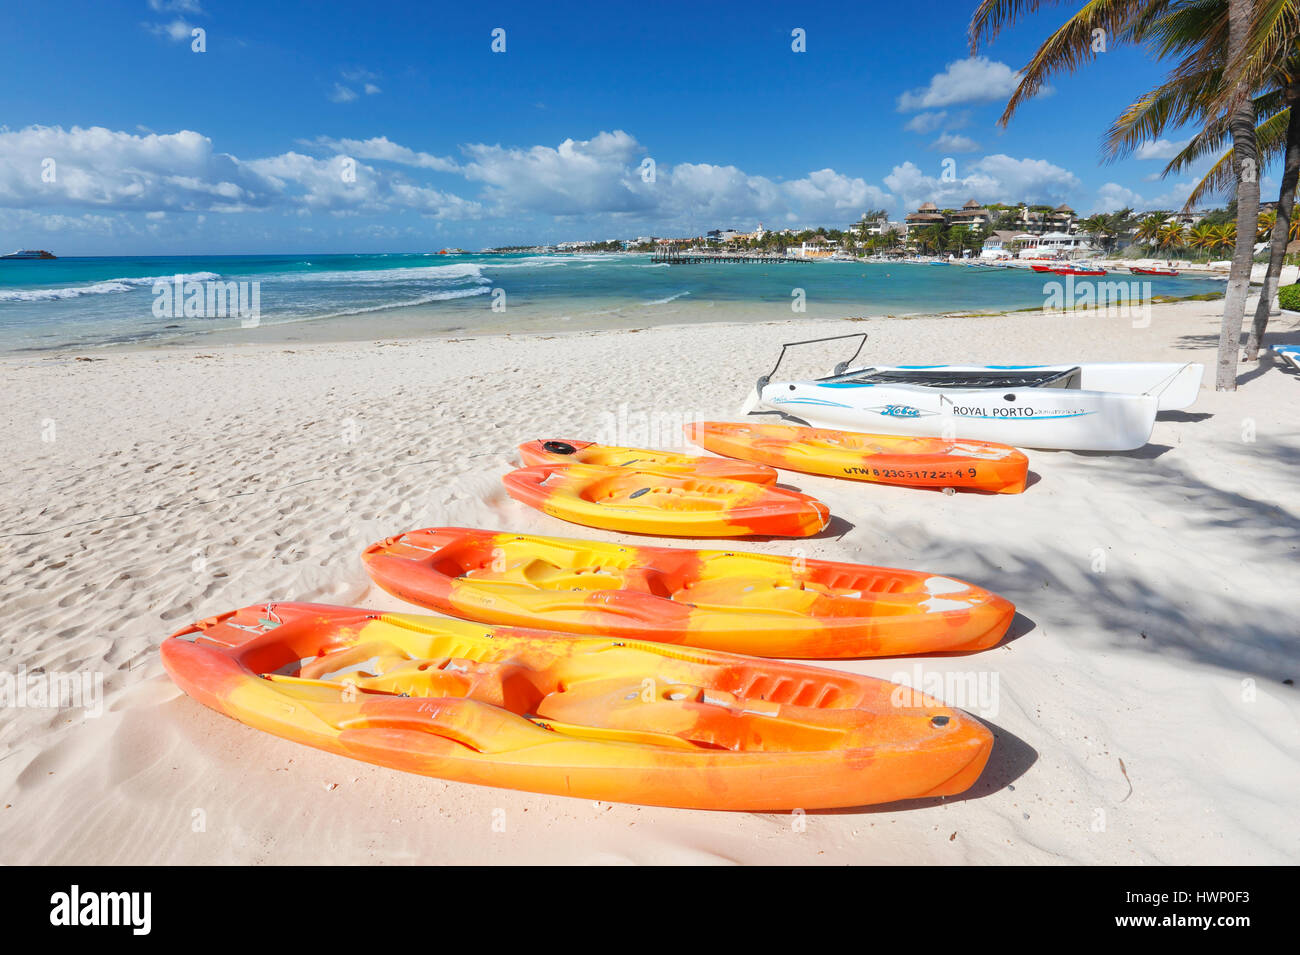 Kayaks on Playa del Carmen sand beach in Mexico Stock Photo